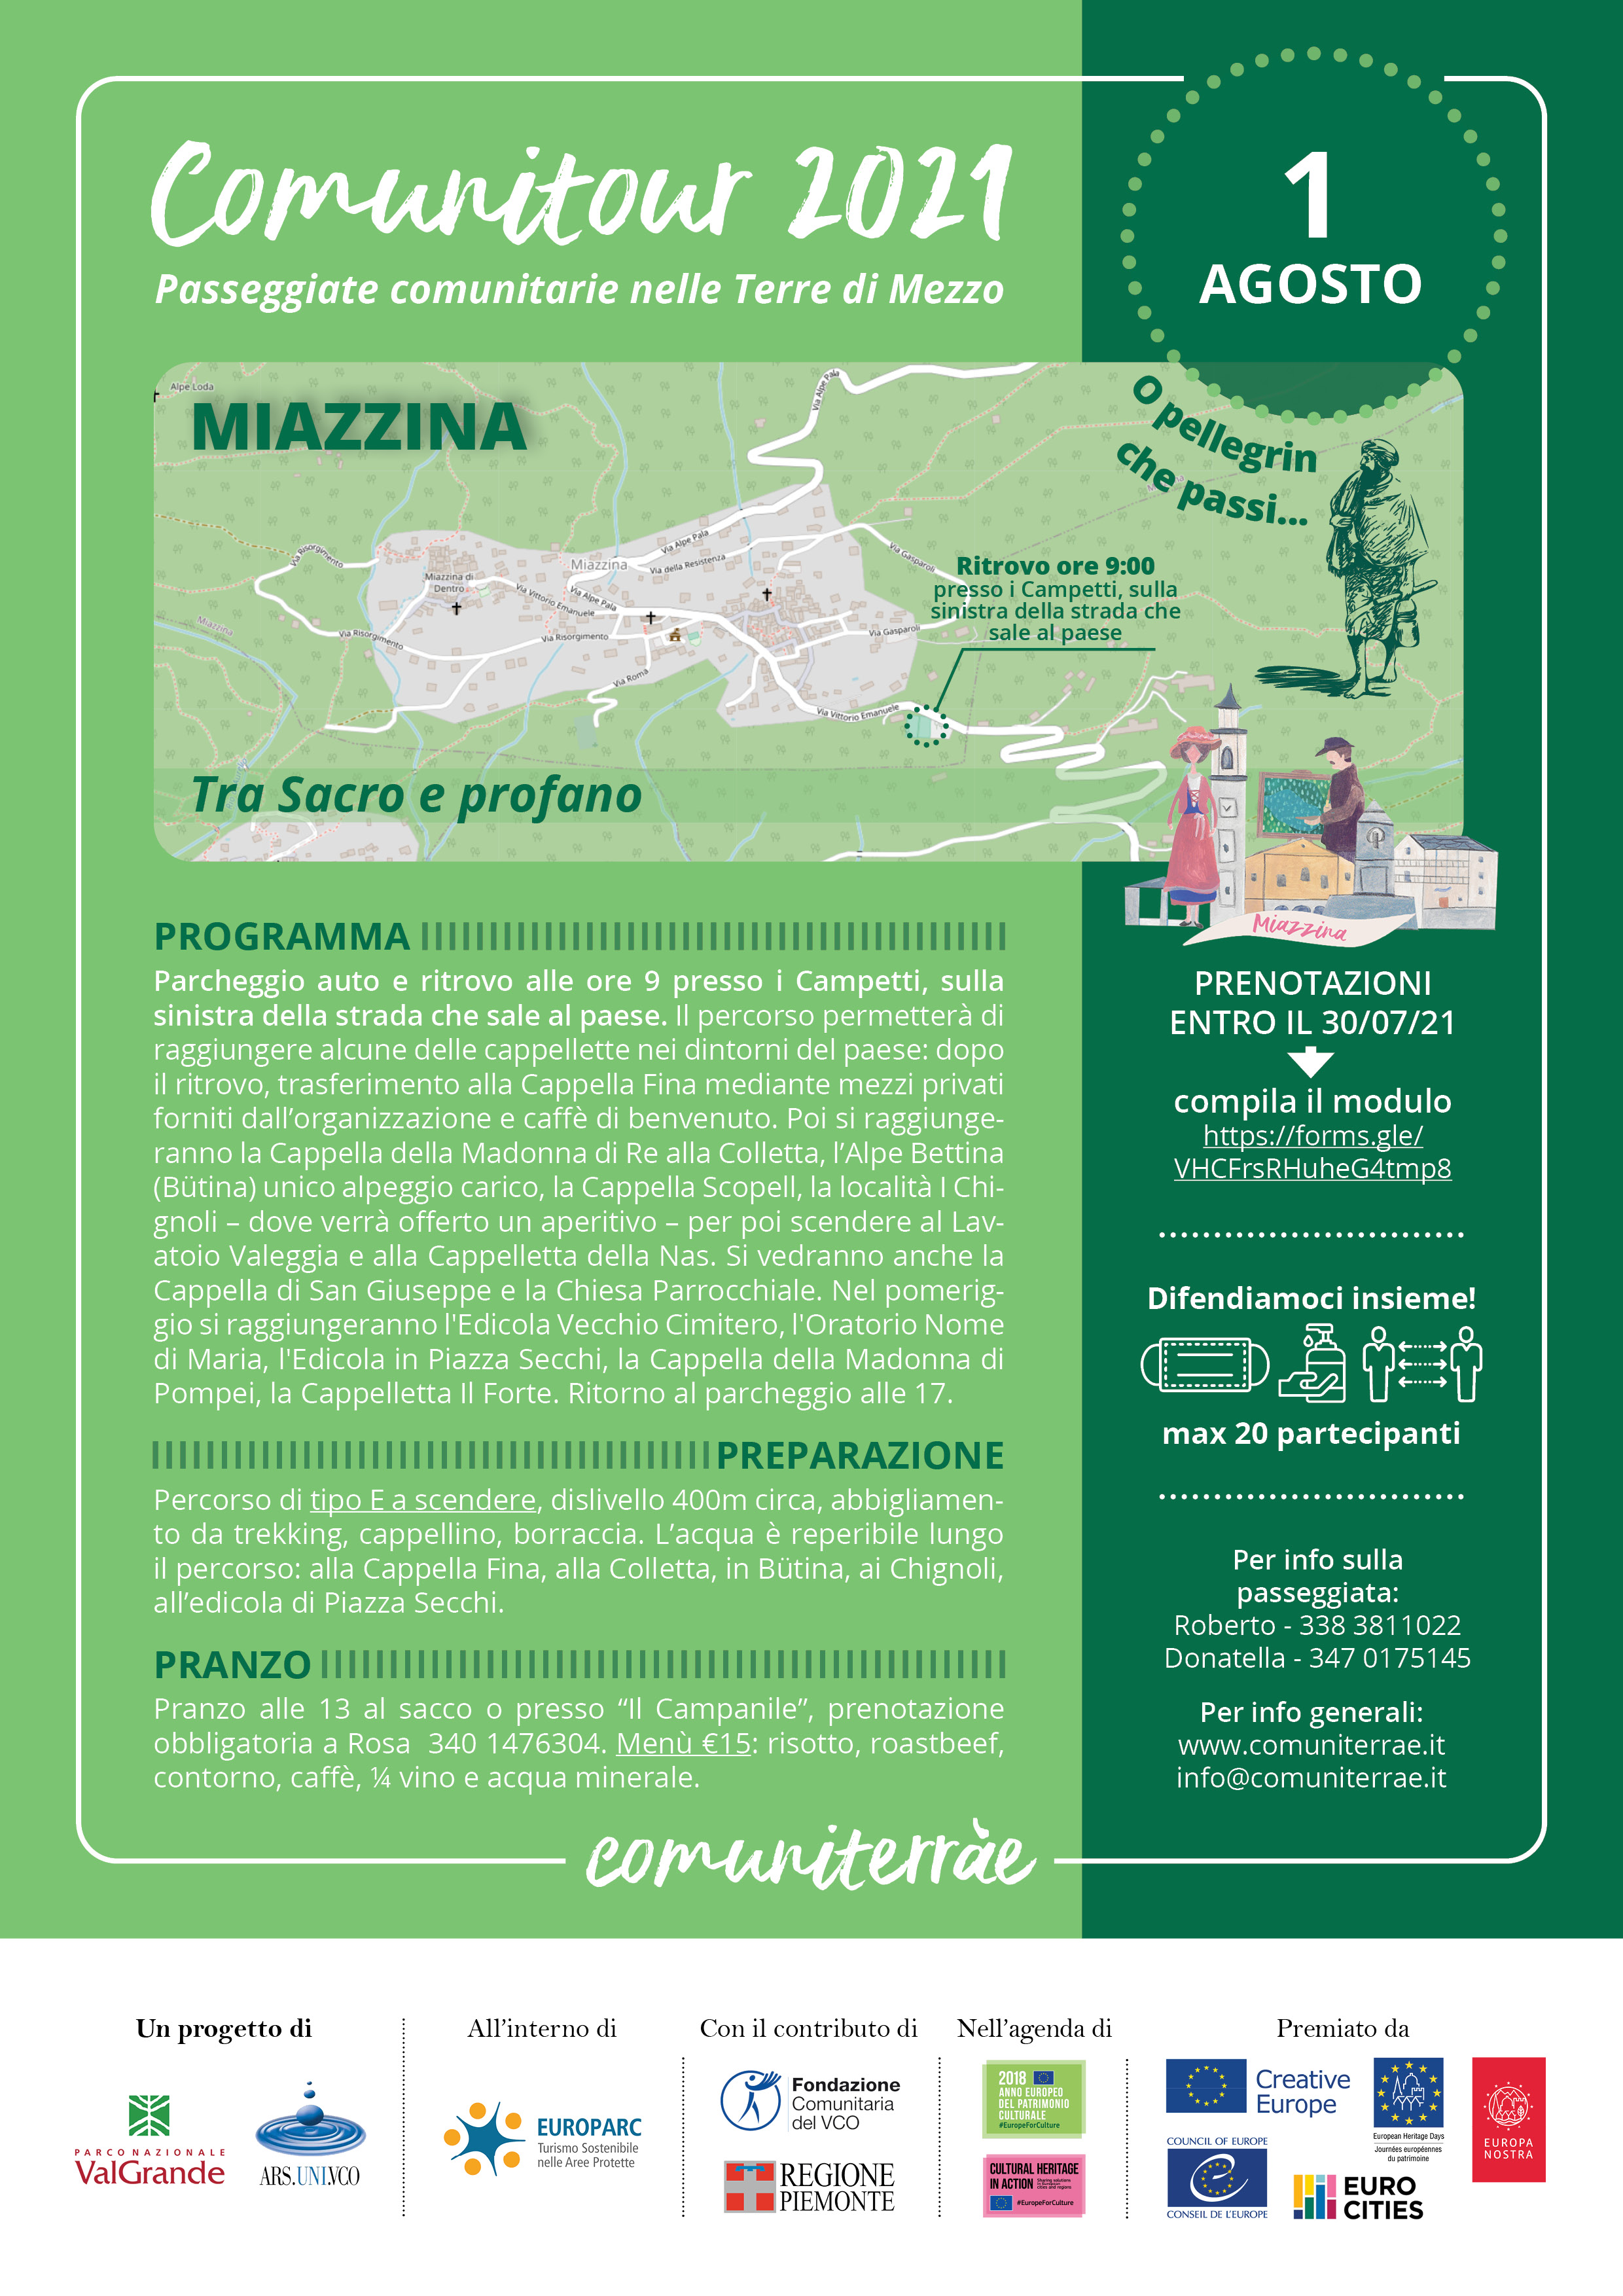 Locandina 1 agosto_Miazzina